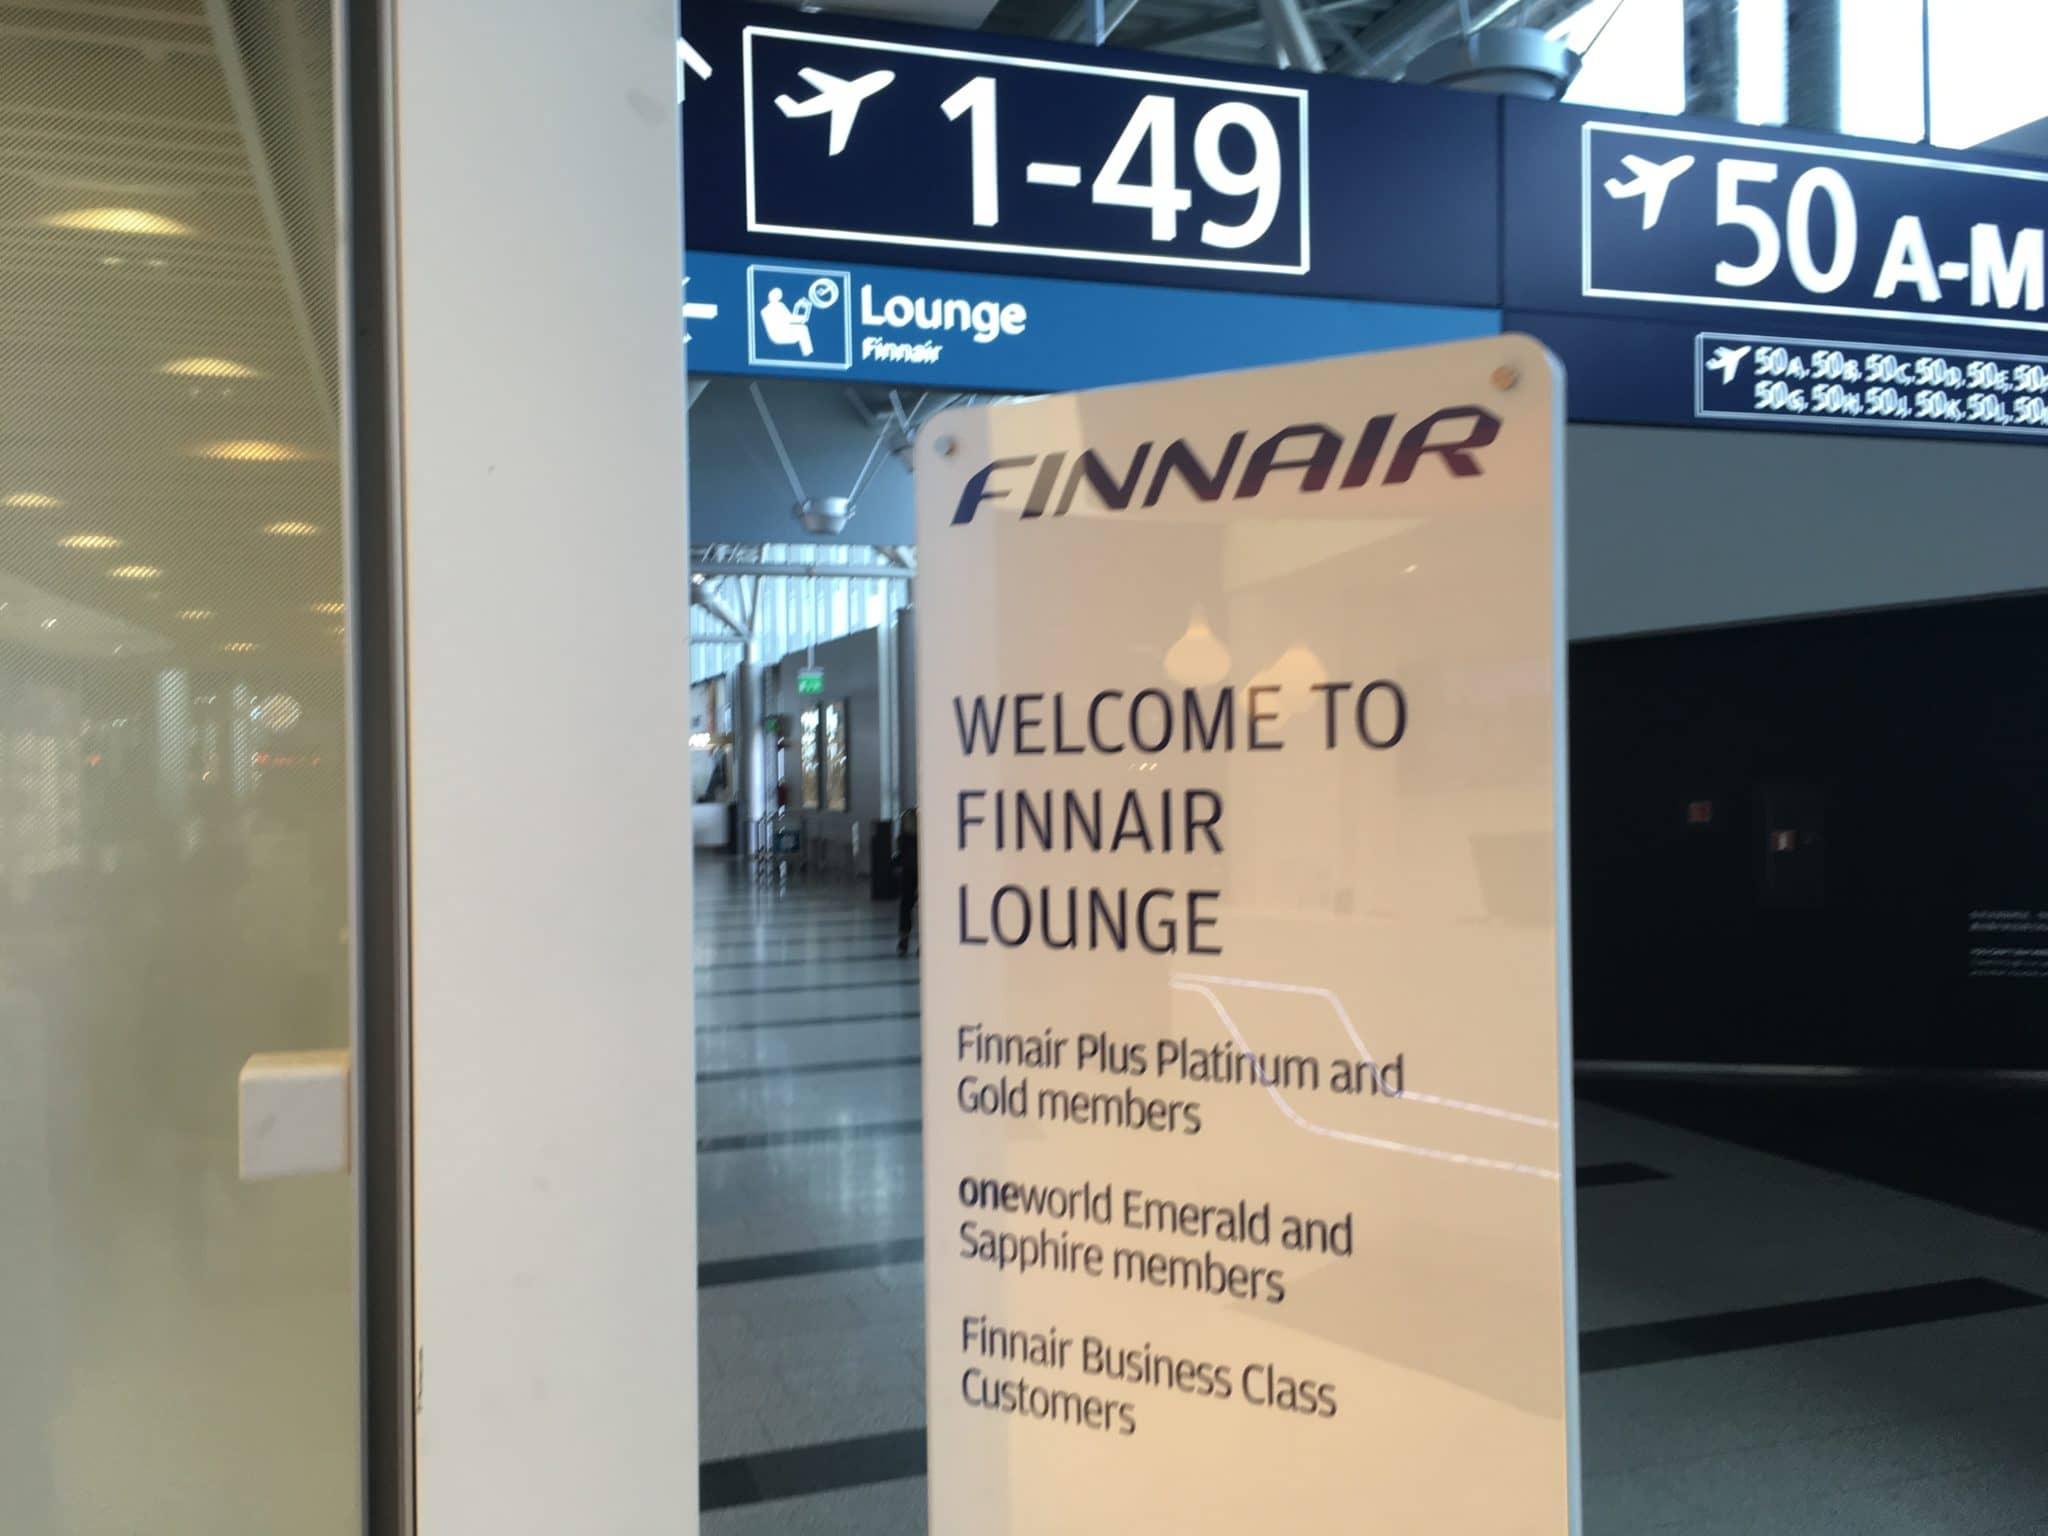 Finnair Lounge Helsinki Non-Schengen Gate 50 Zugangsberechtigte